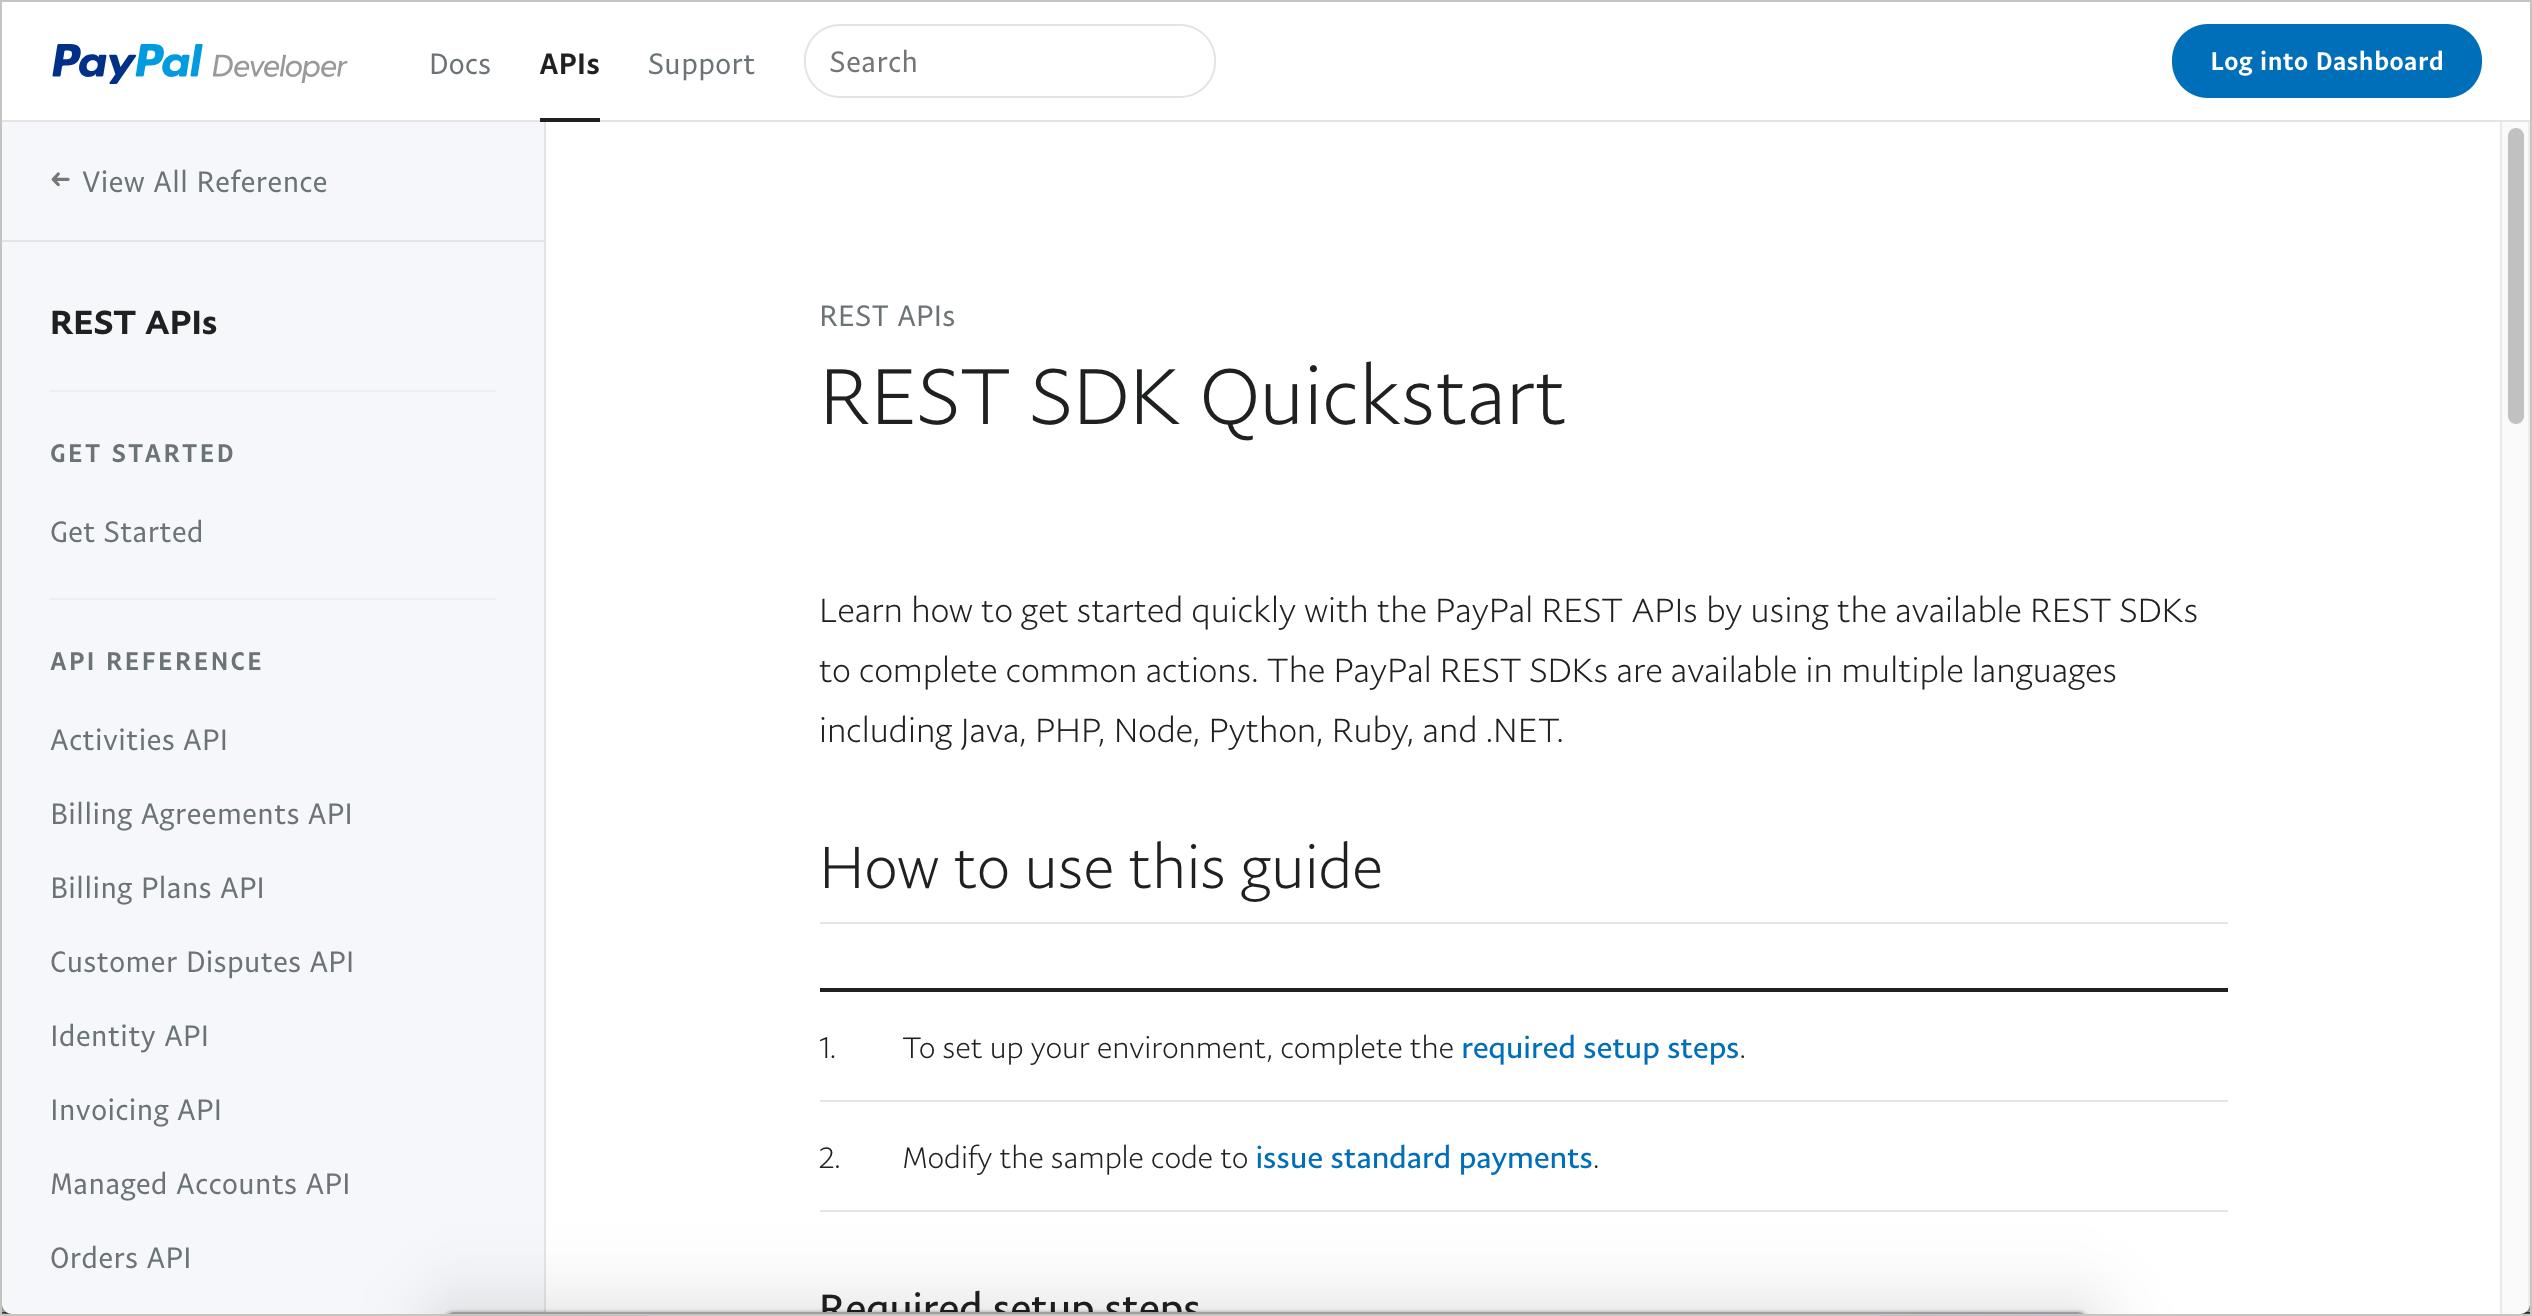 Paypal REST SDKs